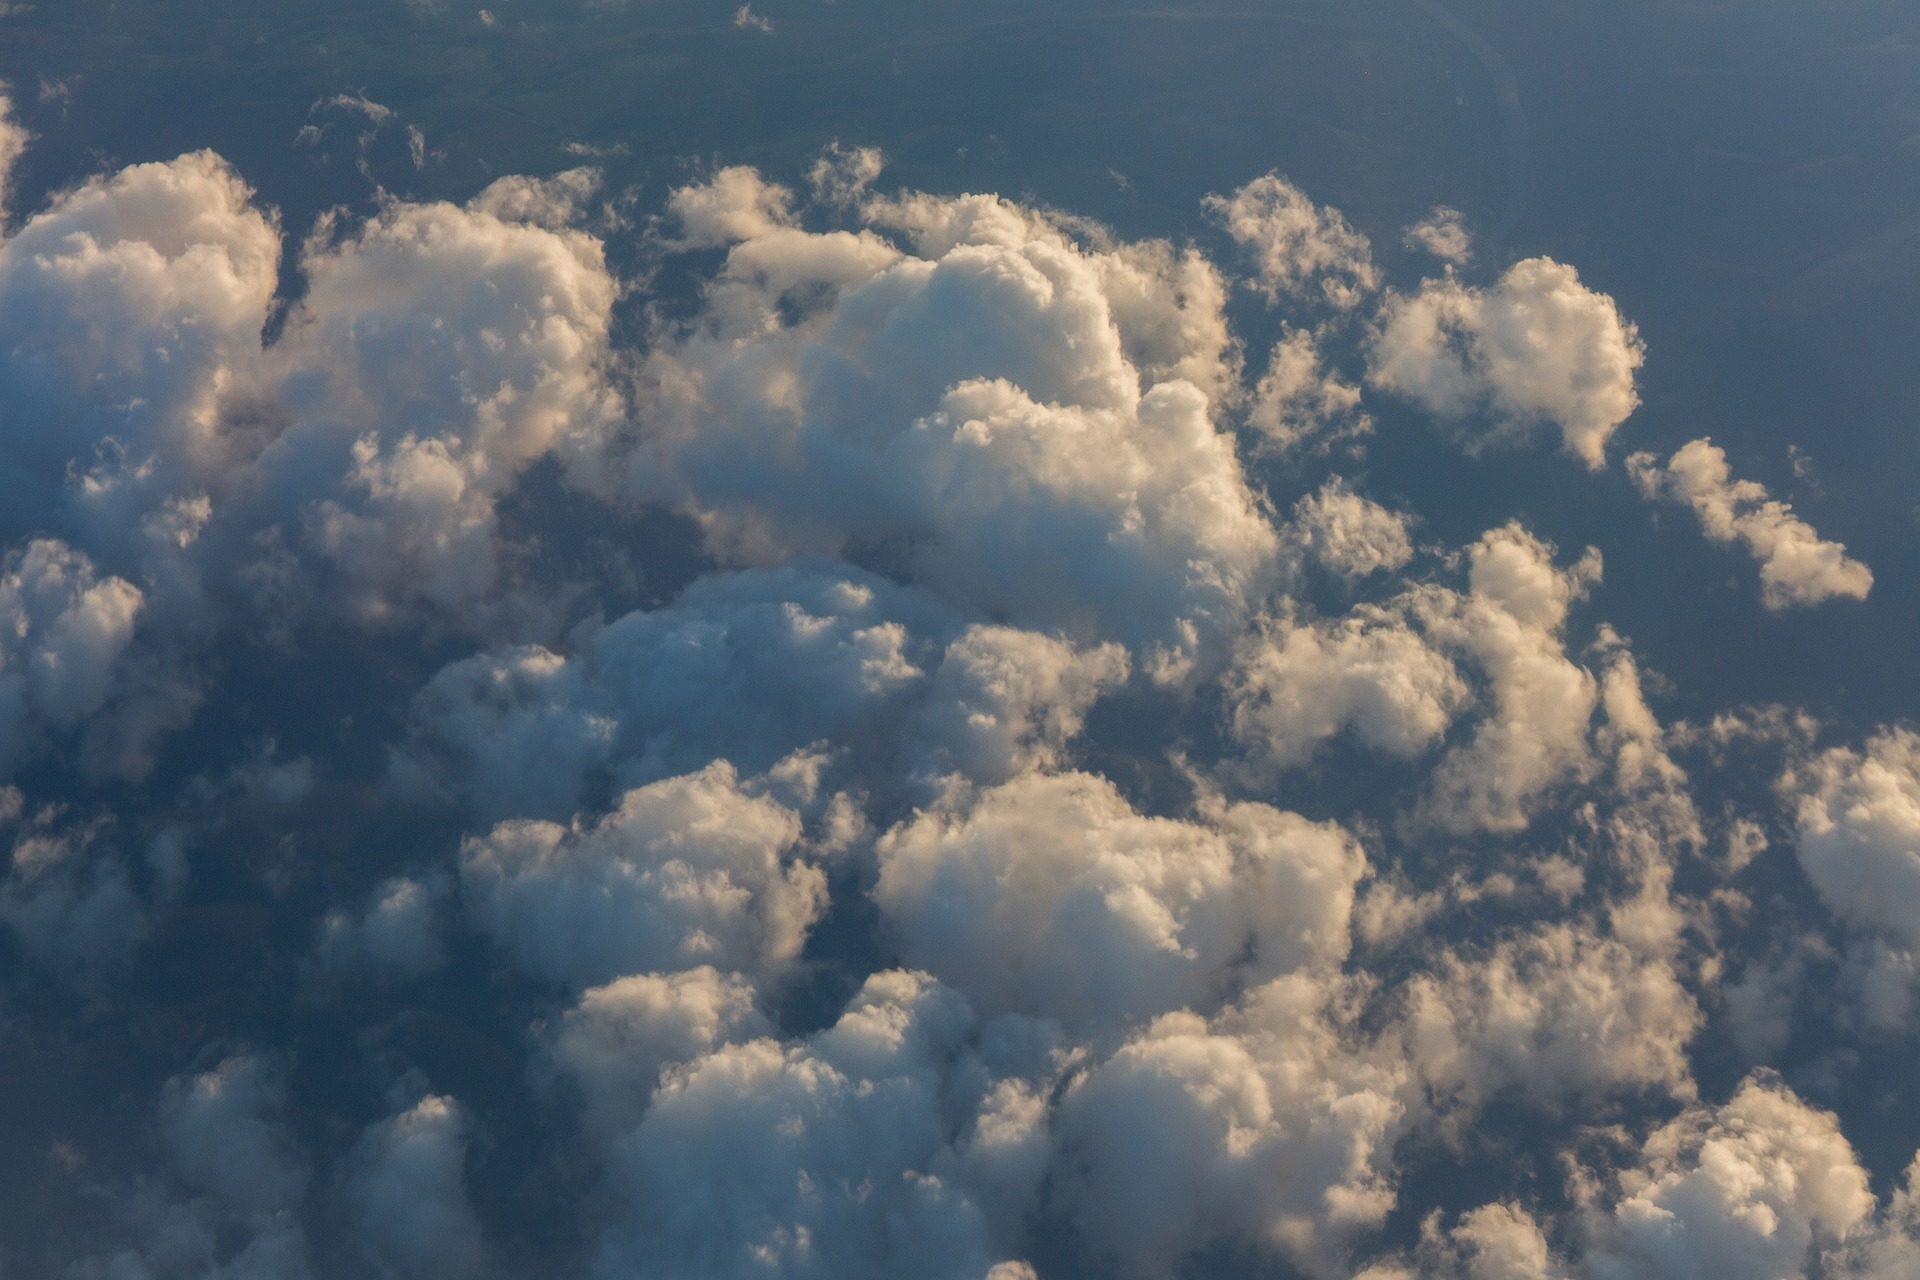 nuvole, vista, aria, Nubi cumuliformi, Cirrus, Cumulonembo, Cielo - Sfondi HD - Professor-falken.com